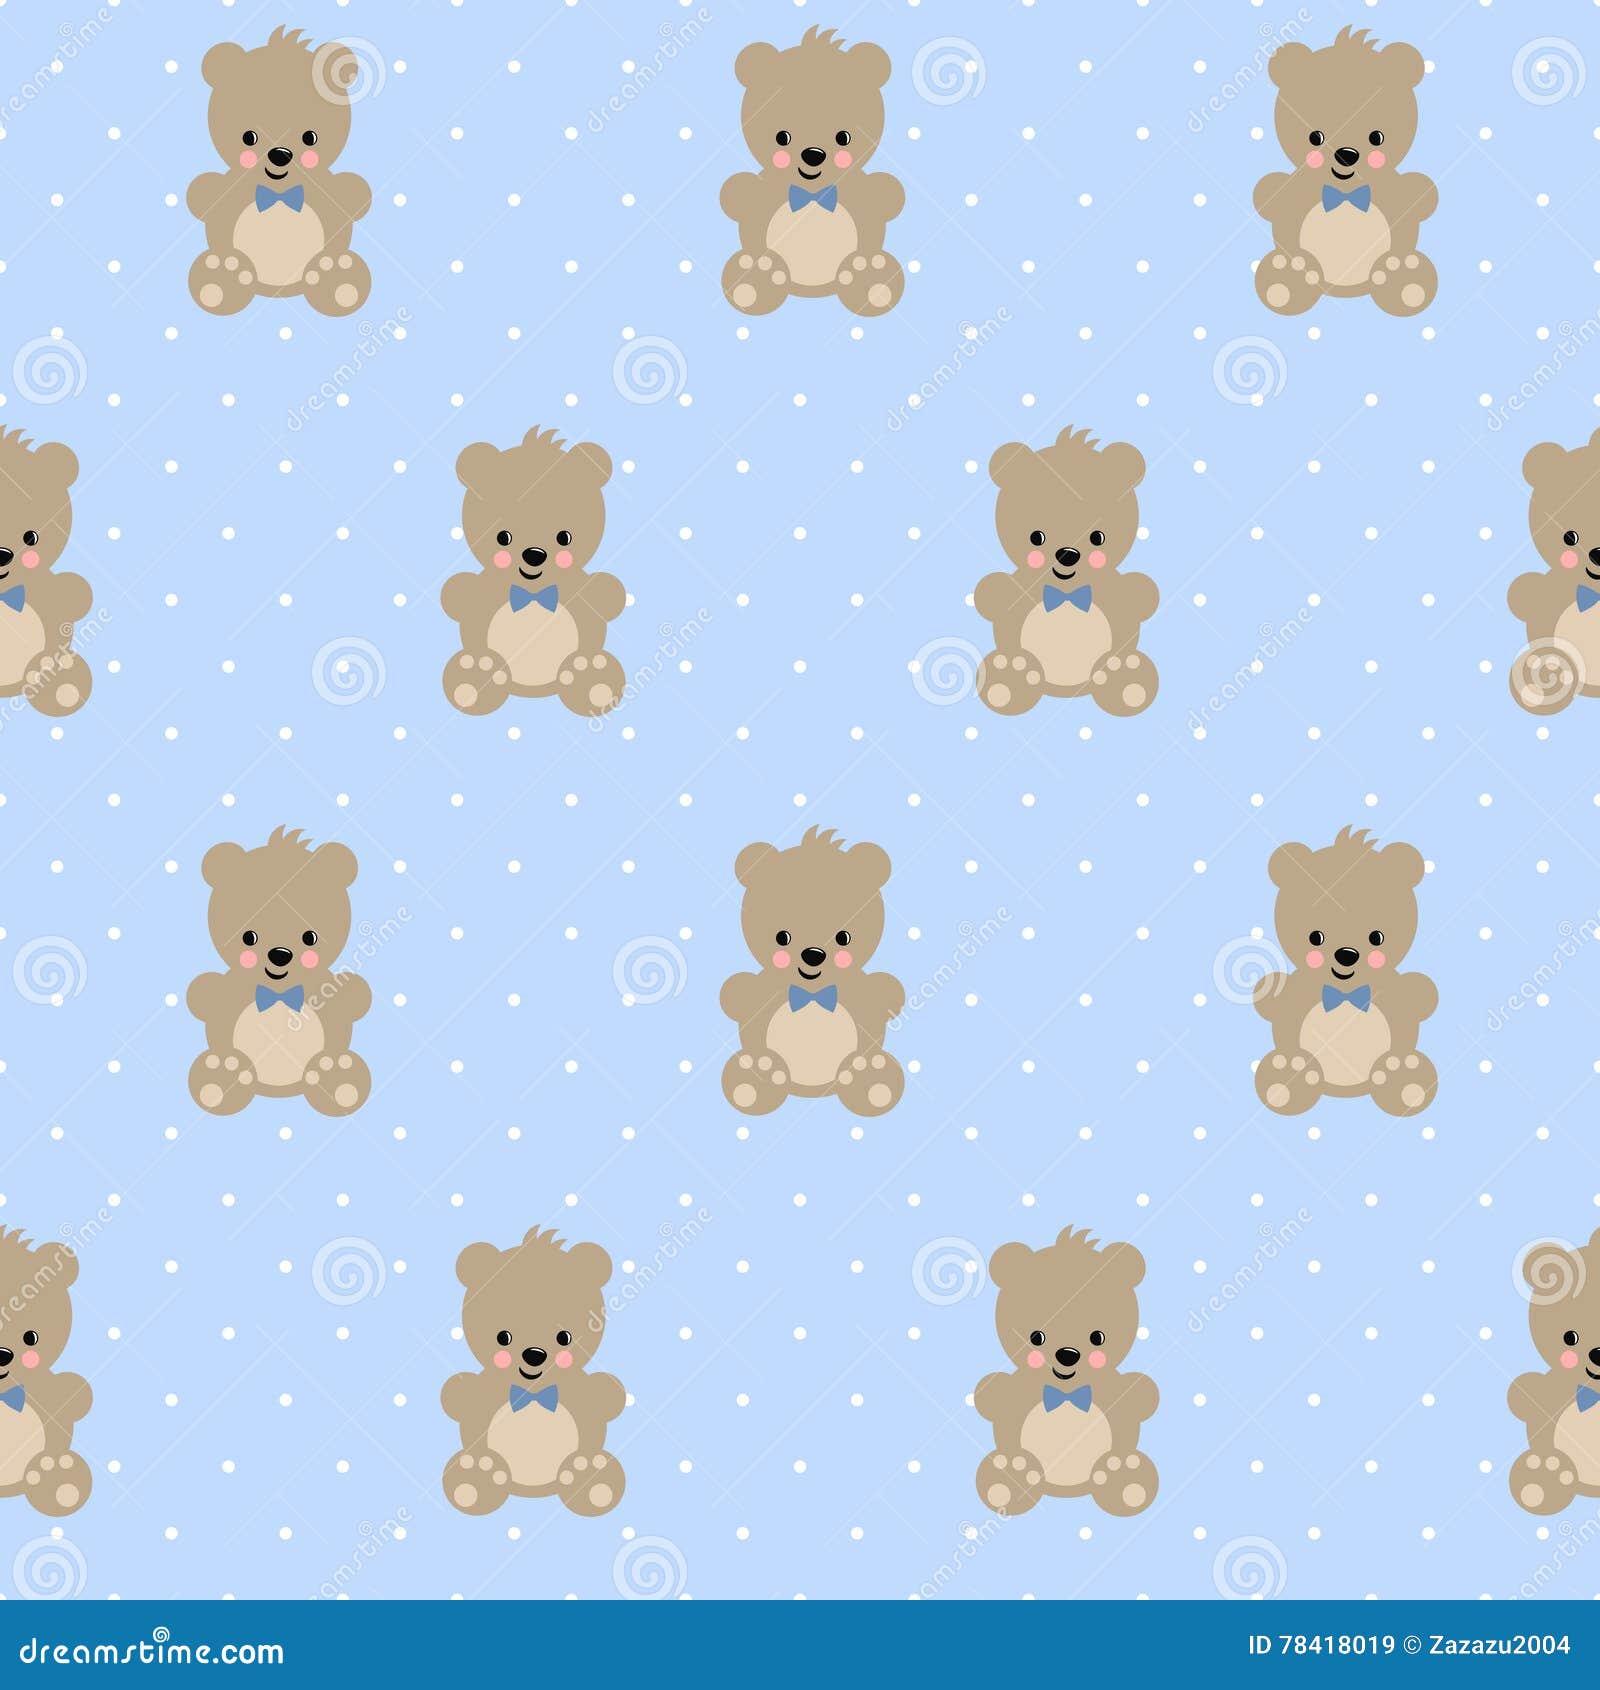 Teddy bear seamless pattern on baby blue polka dots background teddy bear seamless pattern on baby blue polka dots background thecheapjerseys Choice Image